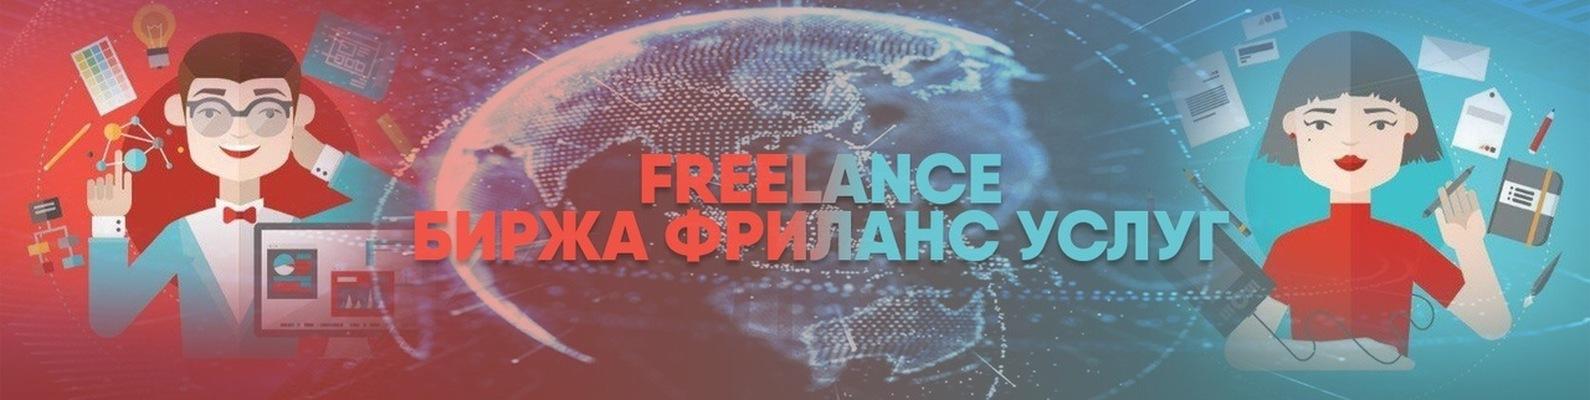 Freelance вакансия работа удаленная работа в луганске